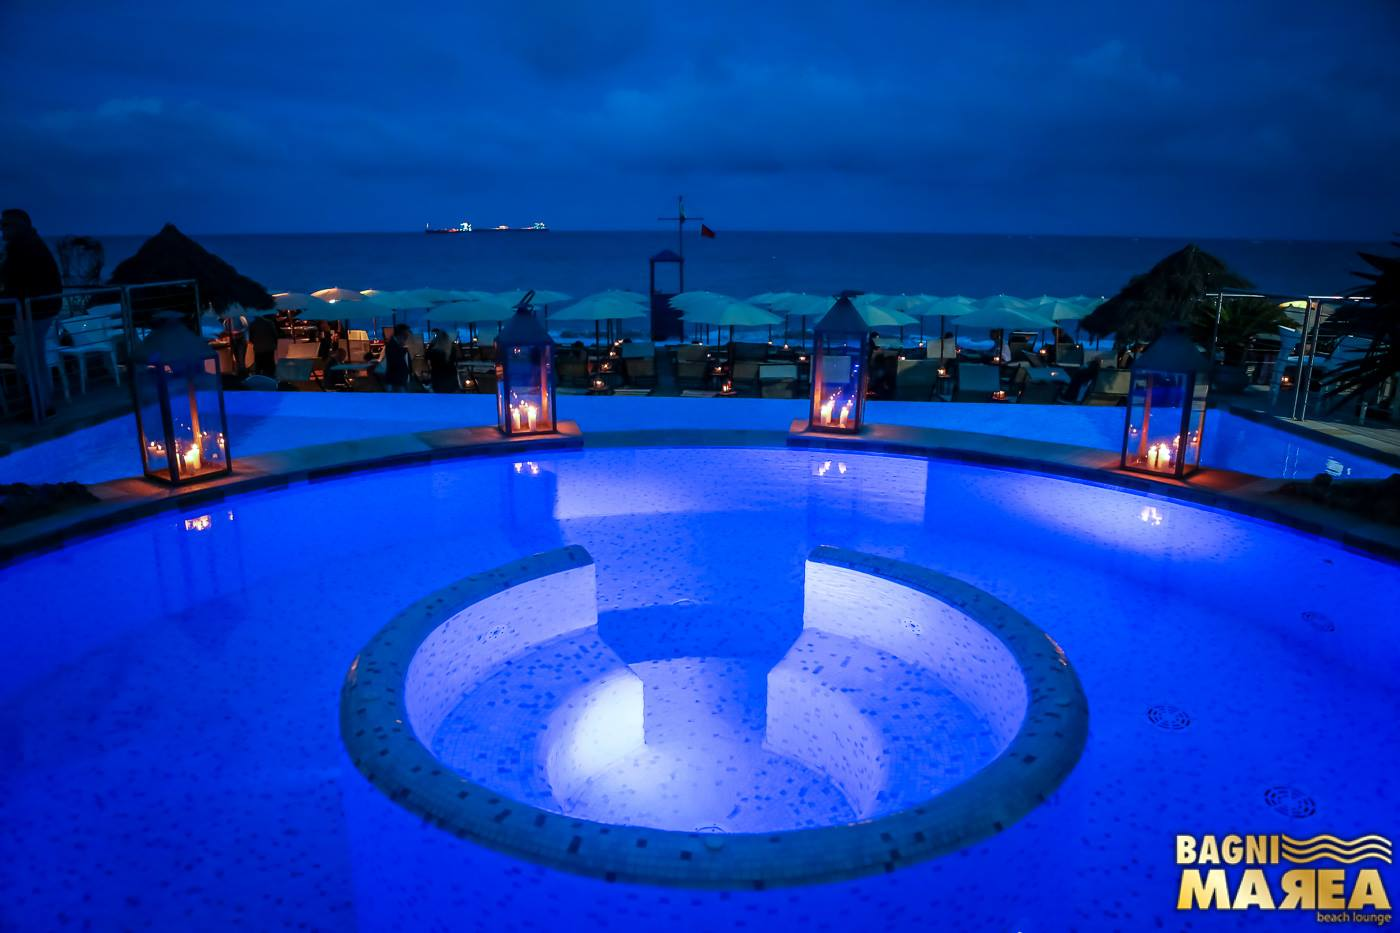 Mare Hotel Bagni Marea piscina - Ariana Soffici